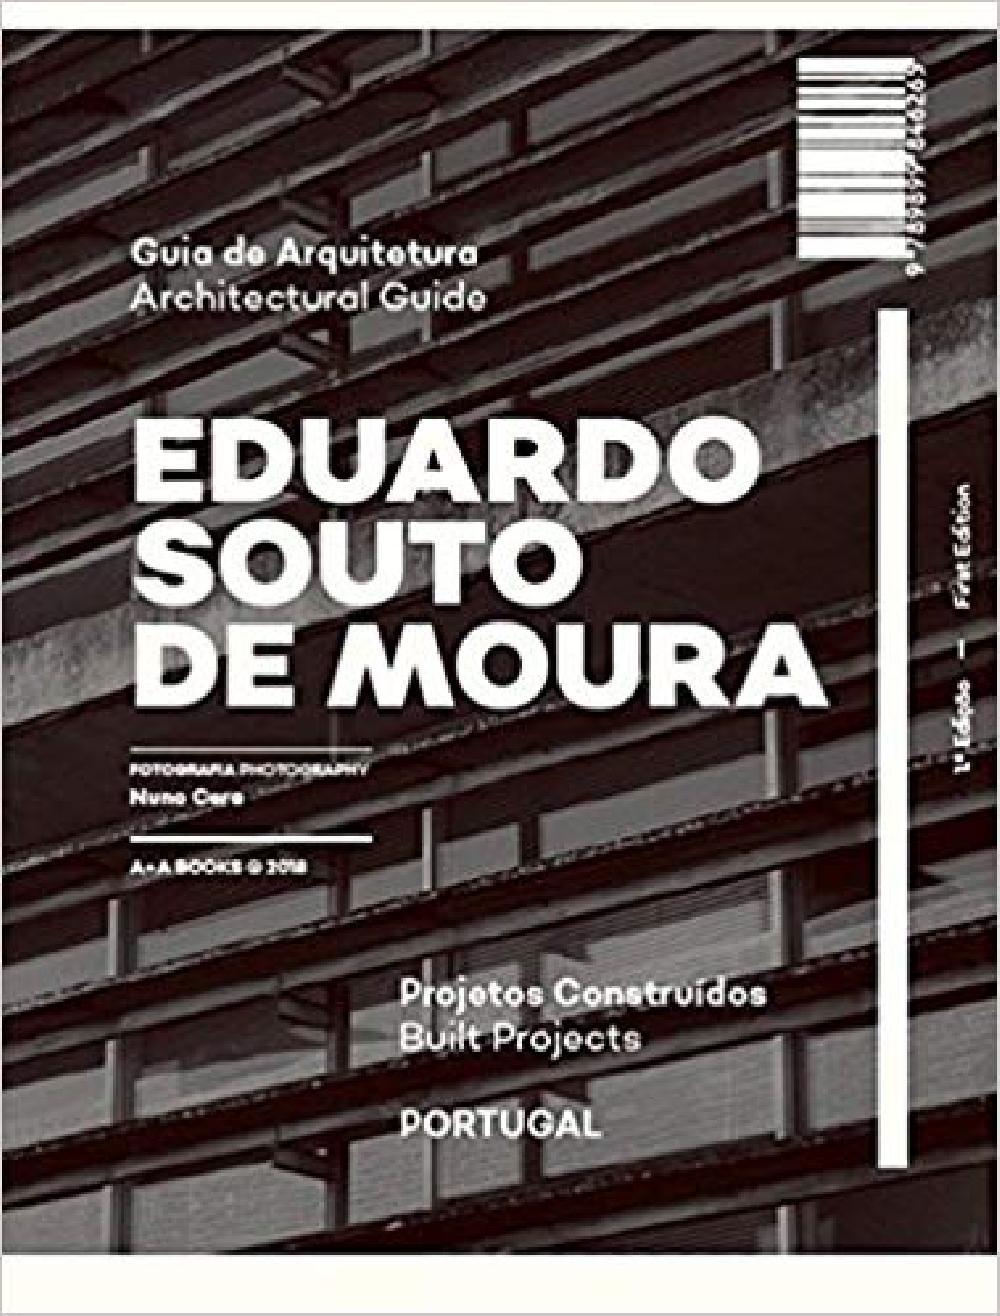 Eduardo Souto De Moura Architectural Guide